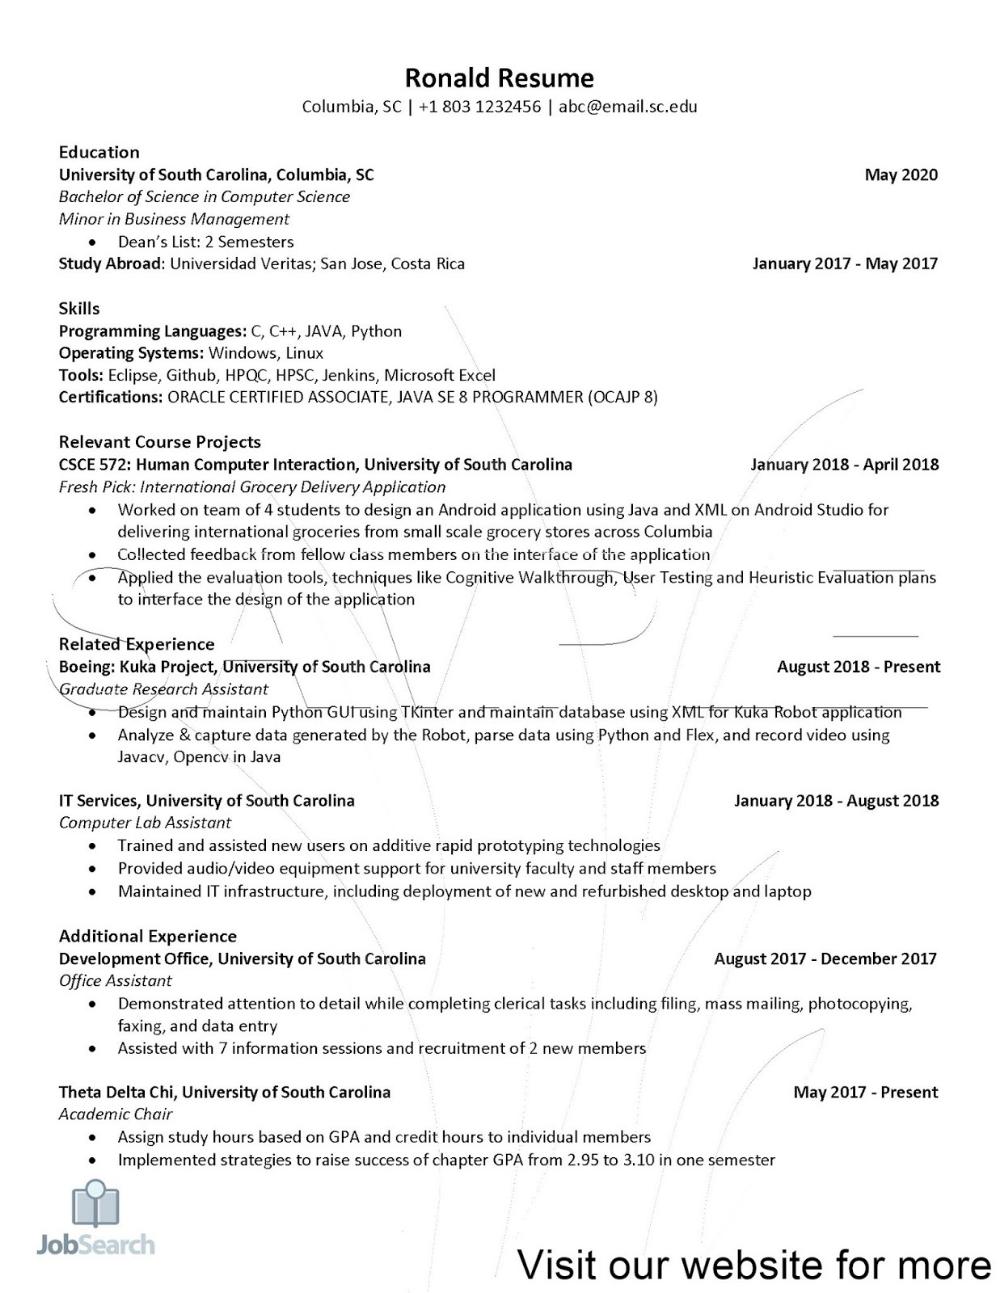 Resume For Engineering Internship Students 2020 Resume For Engineering Resume For Engineerin In 2020 Student Resume Template Engineering Internships Student Resume